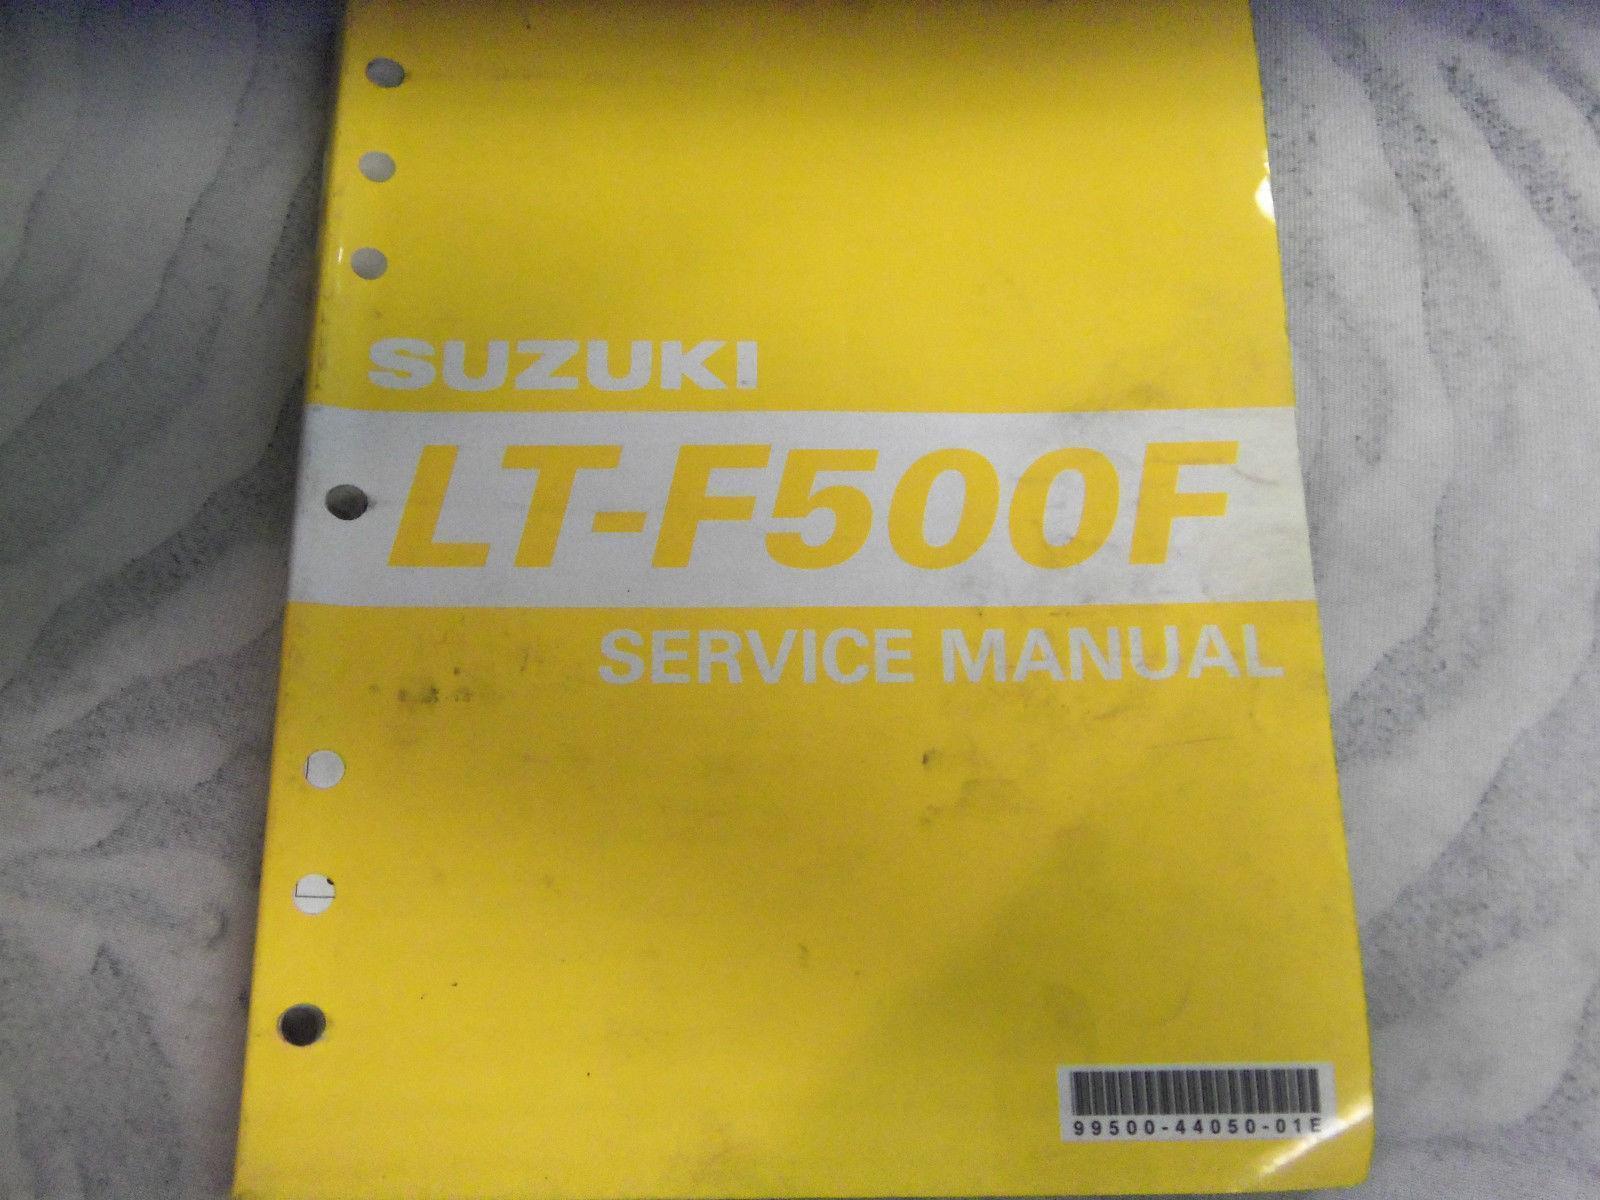 Suzuki LT-F500F Genuine Service Manual 99500-44050-01E · «